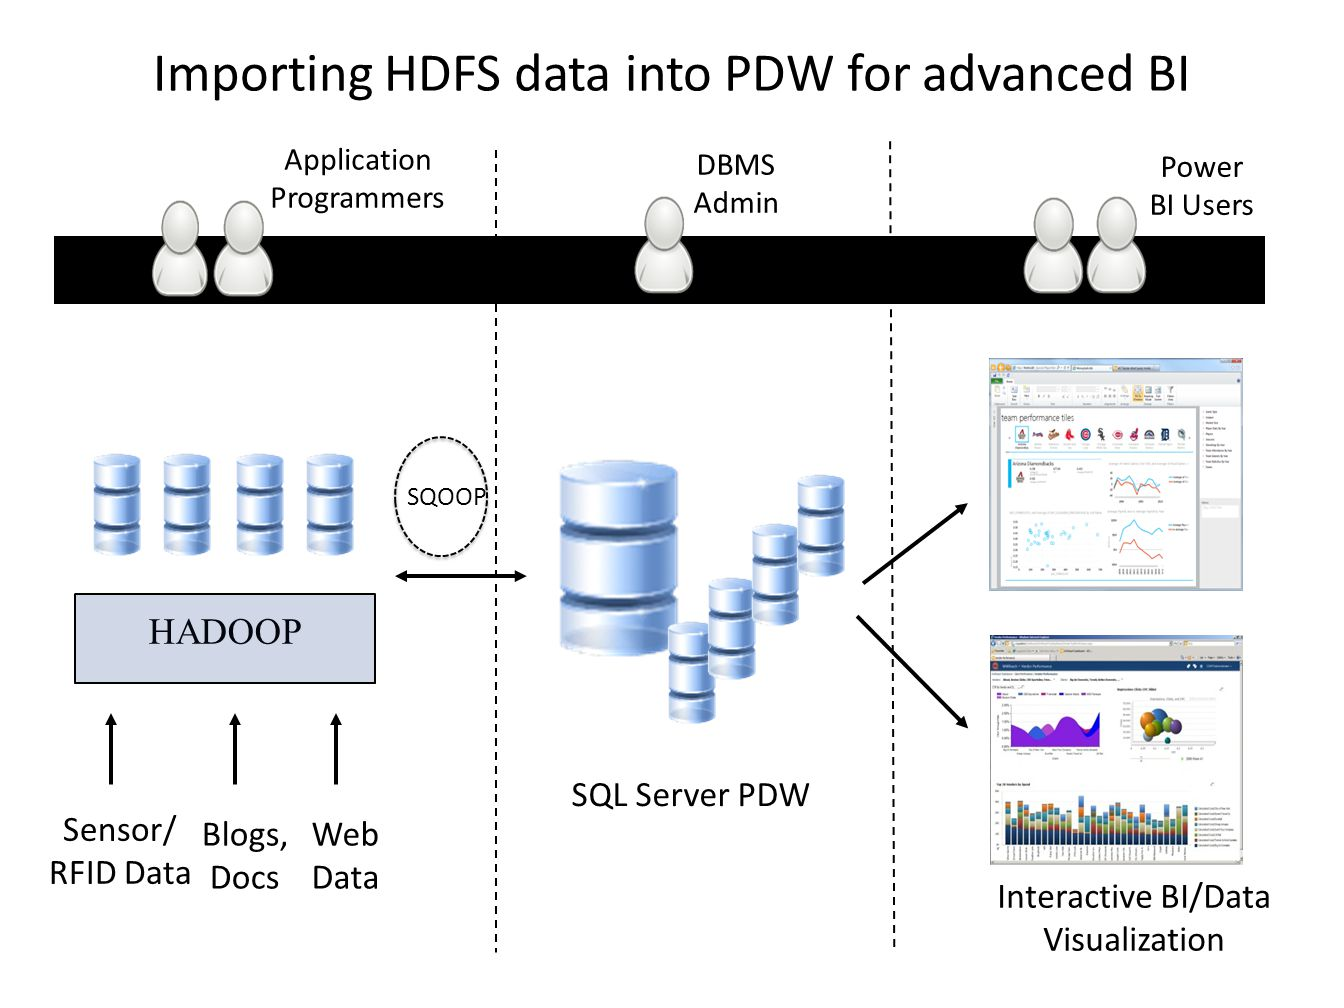 Importing HDFS data into PDW for advanced BI HADOOP Sensor/ RFID Data Blogs, Docs Web Data SQL Server PDW Interactive BI/Data Visualization SQOOP Appl